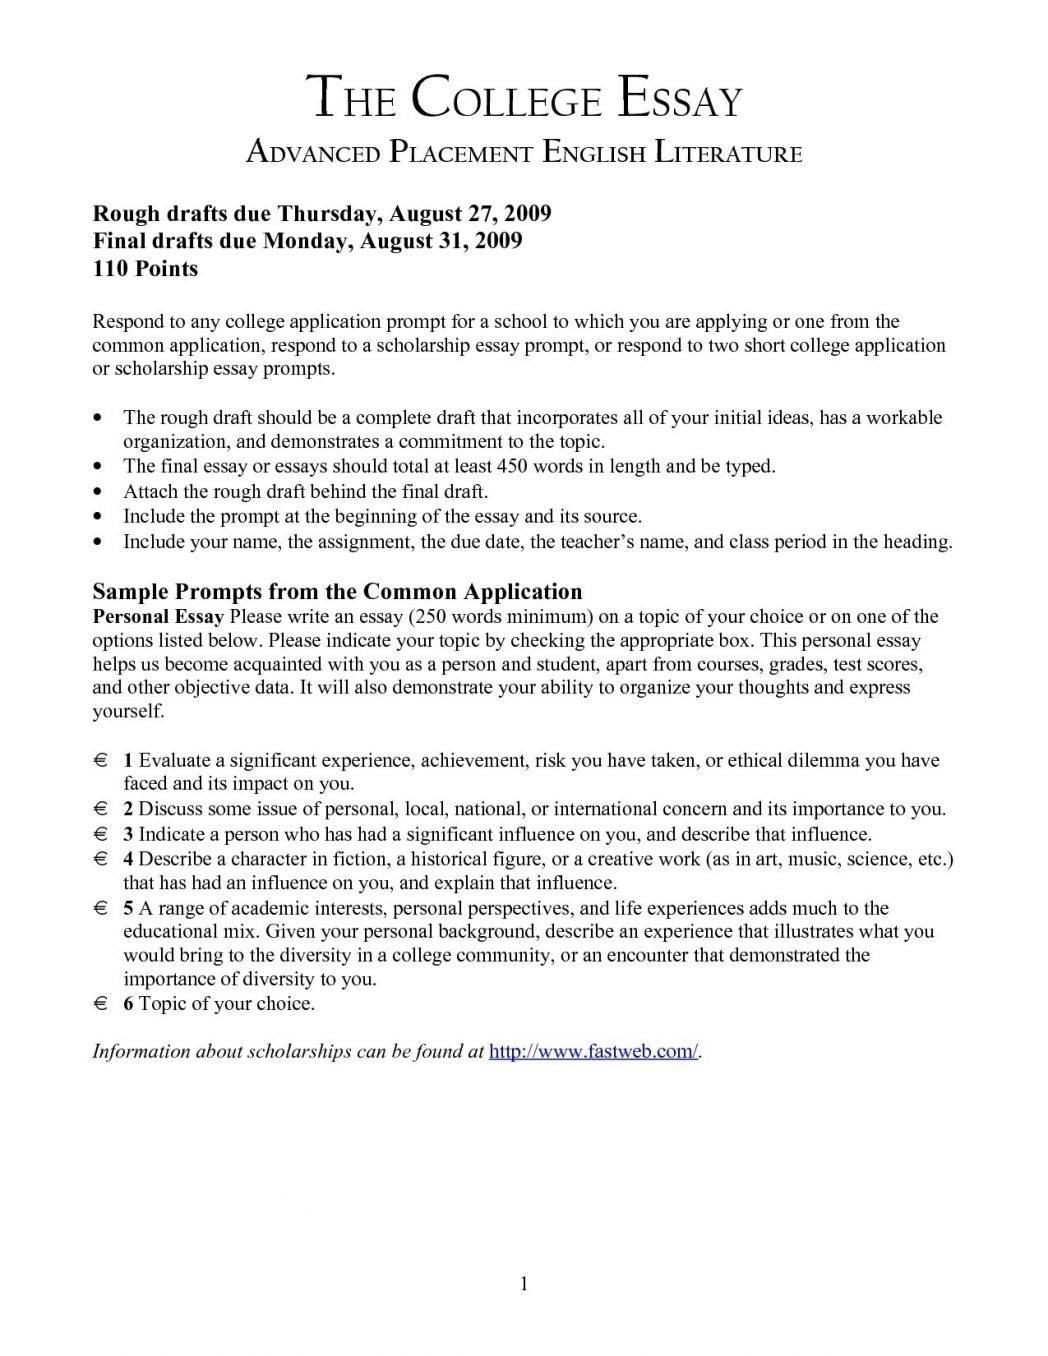 berkeley college application essay